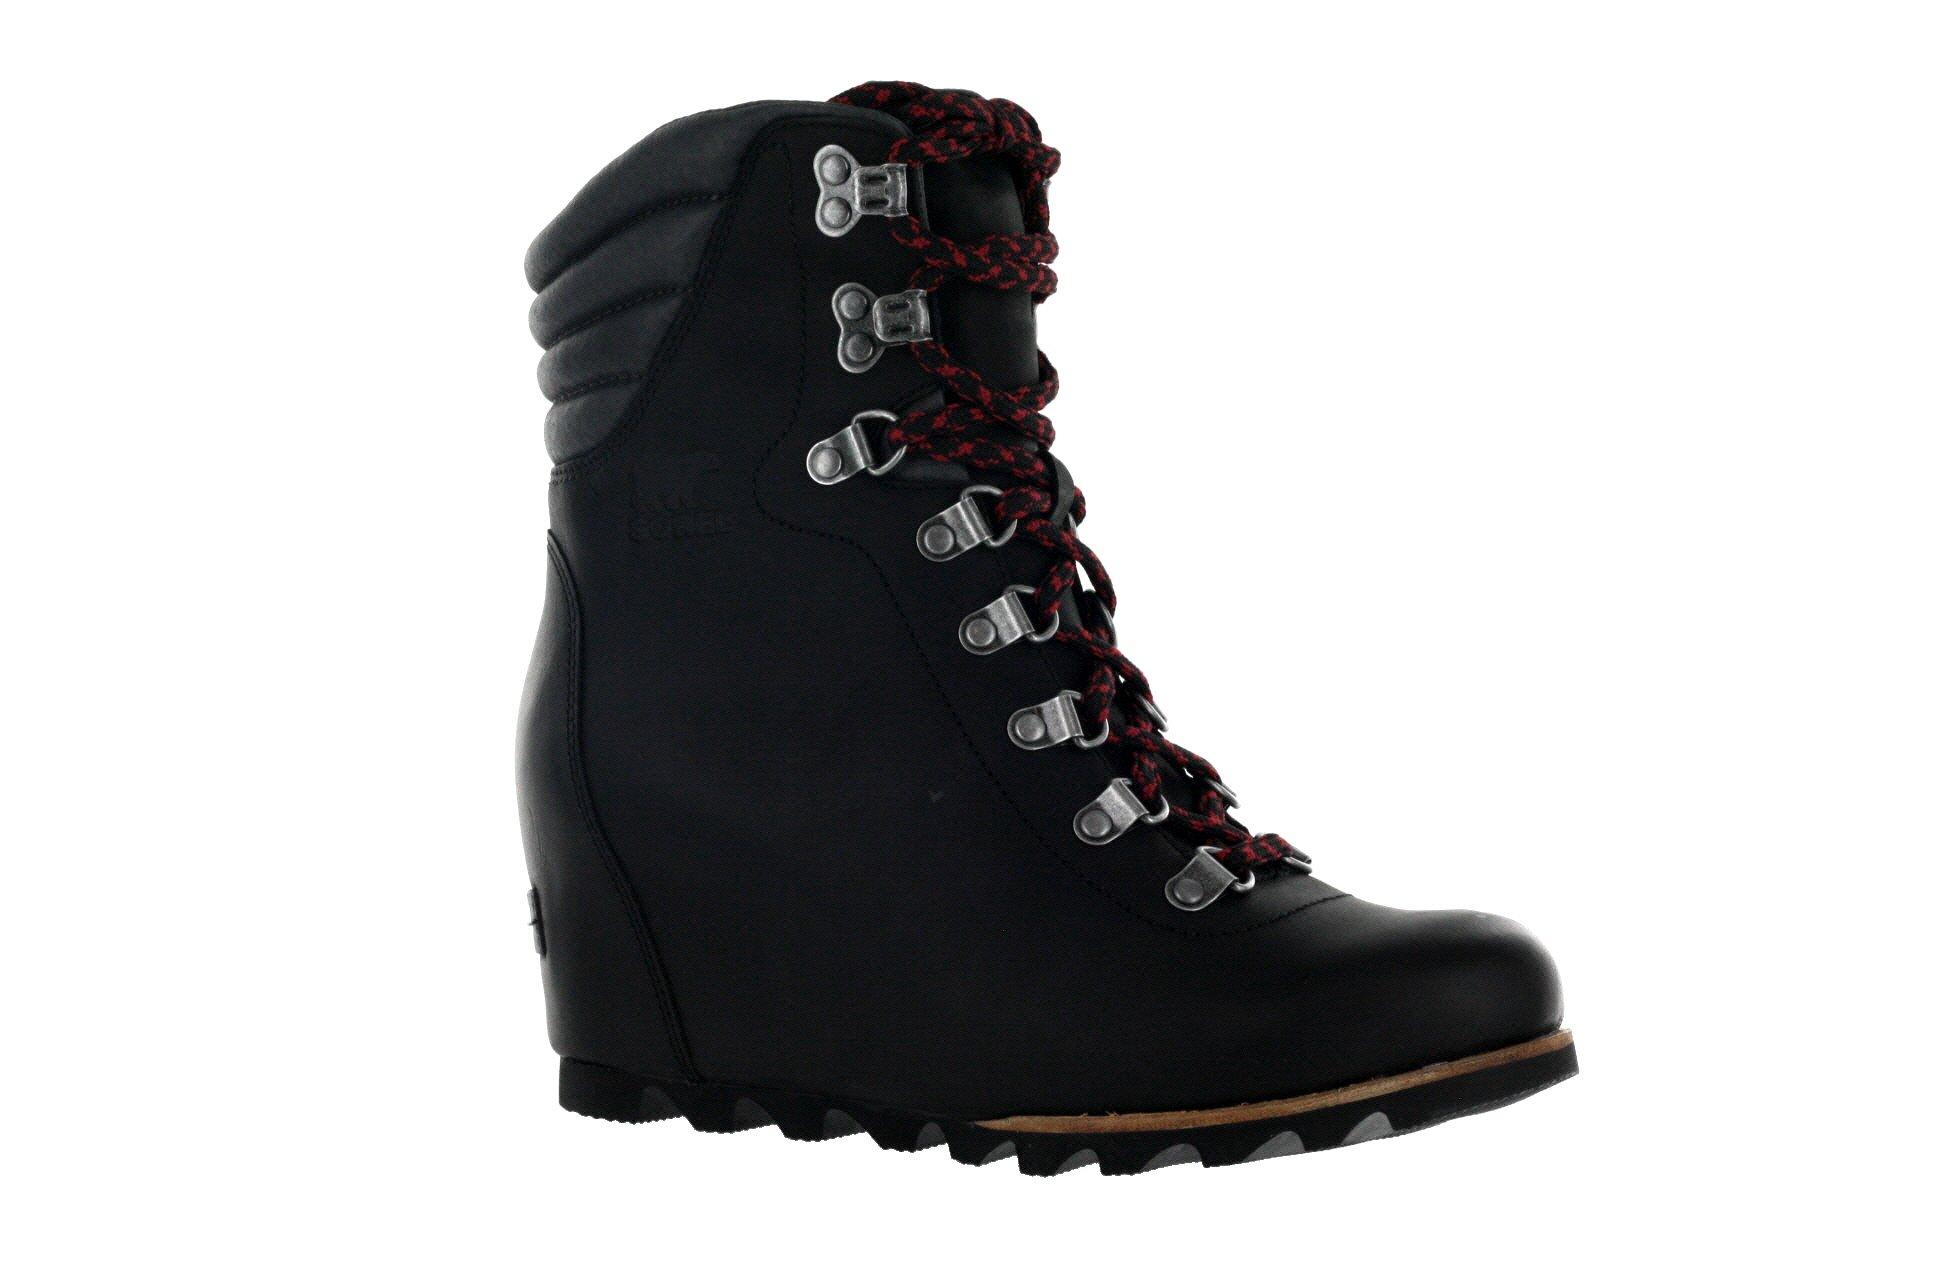 SOREL Women's Conquest Wedge Booties, Black, 8.5 B(M) US